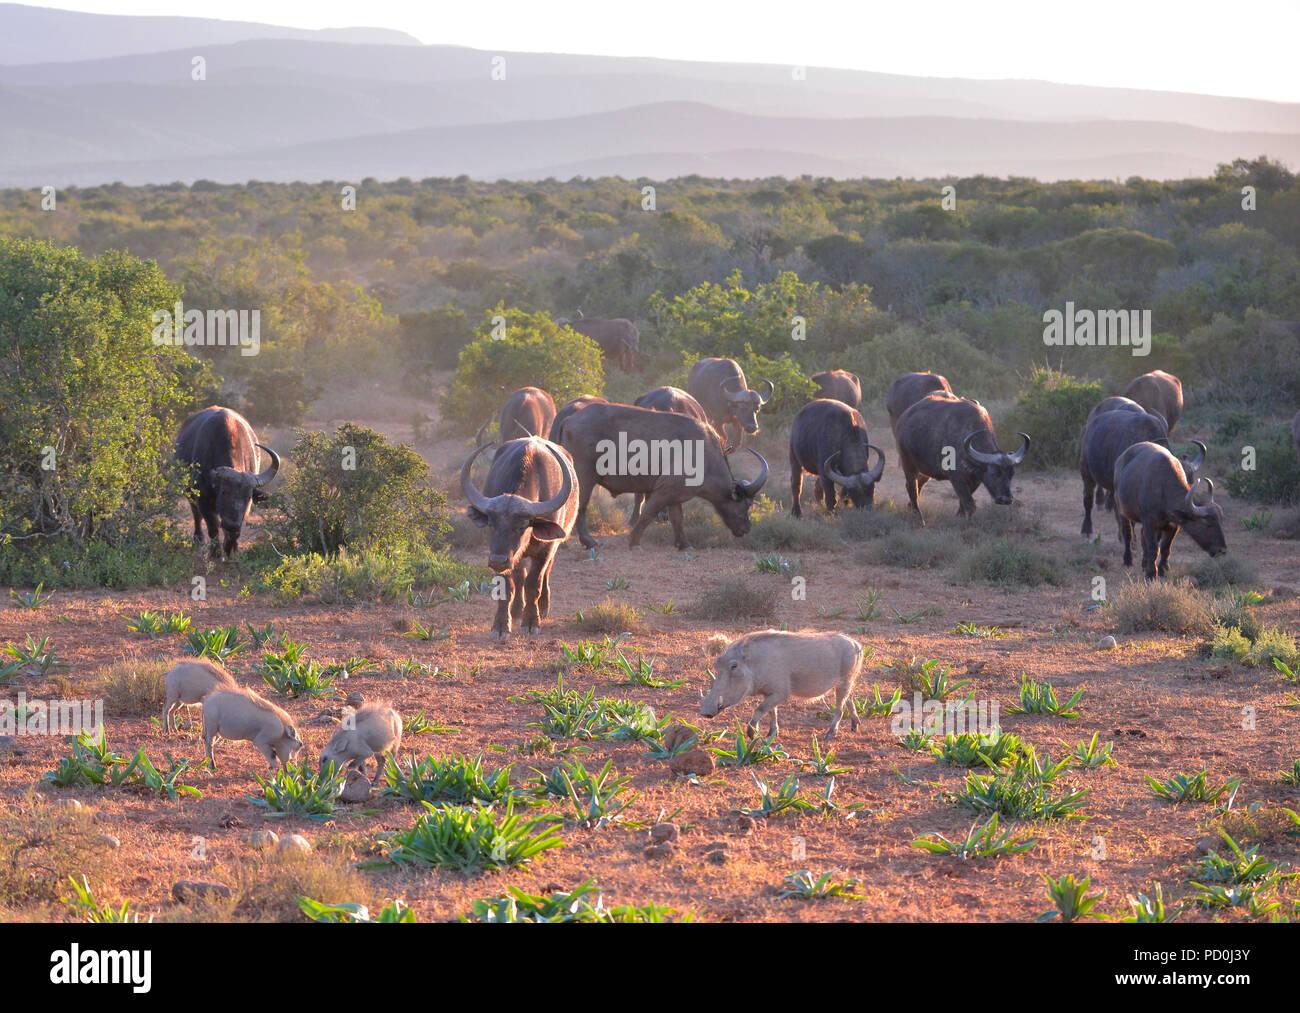 Sud Africa. Buffalo mandria e warthog famiglia insieme pacificamente in Addo Elephant National Park. Immagini Stock